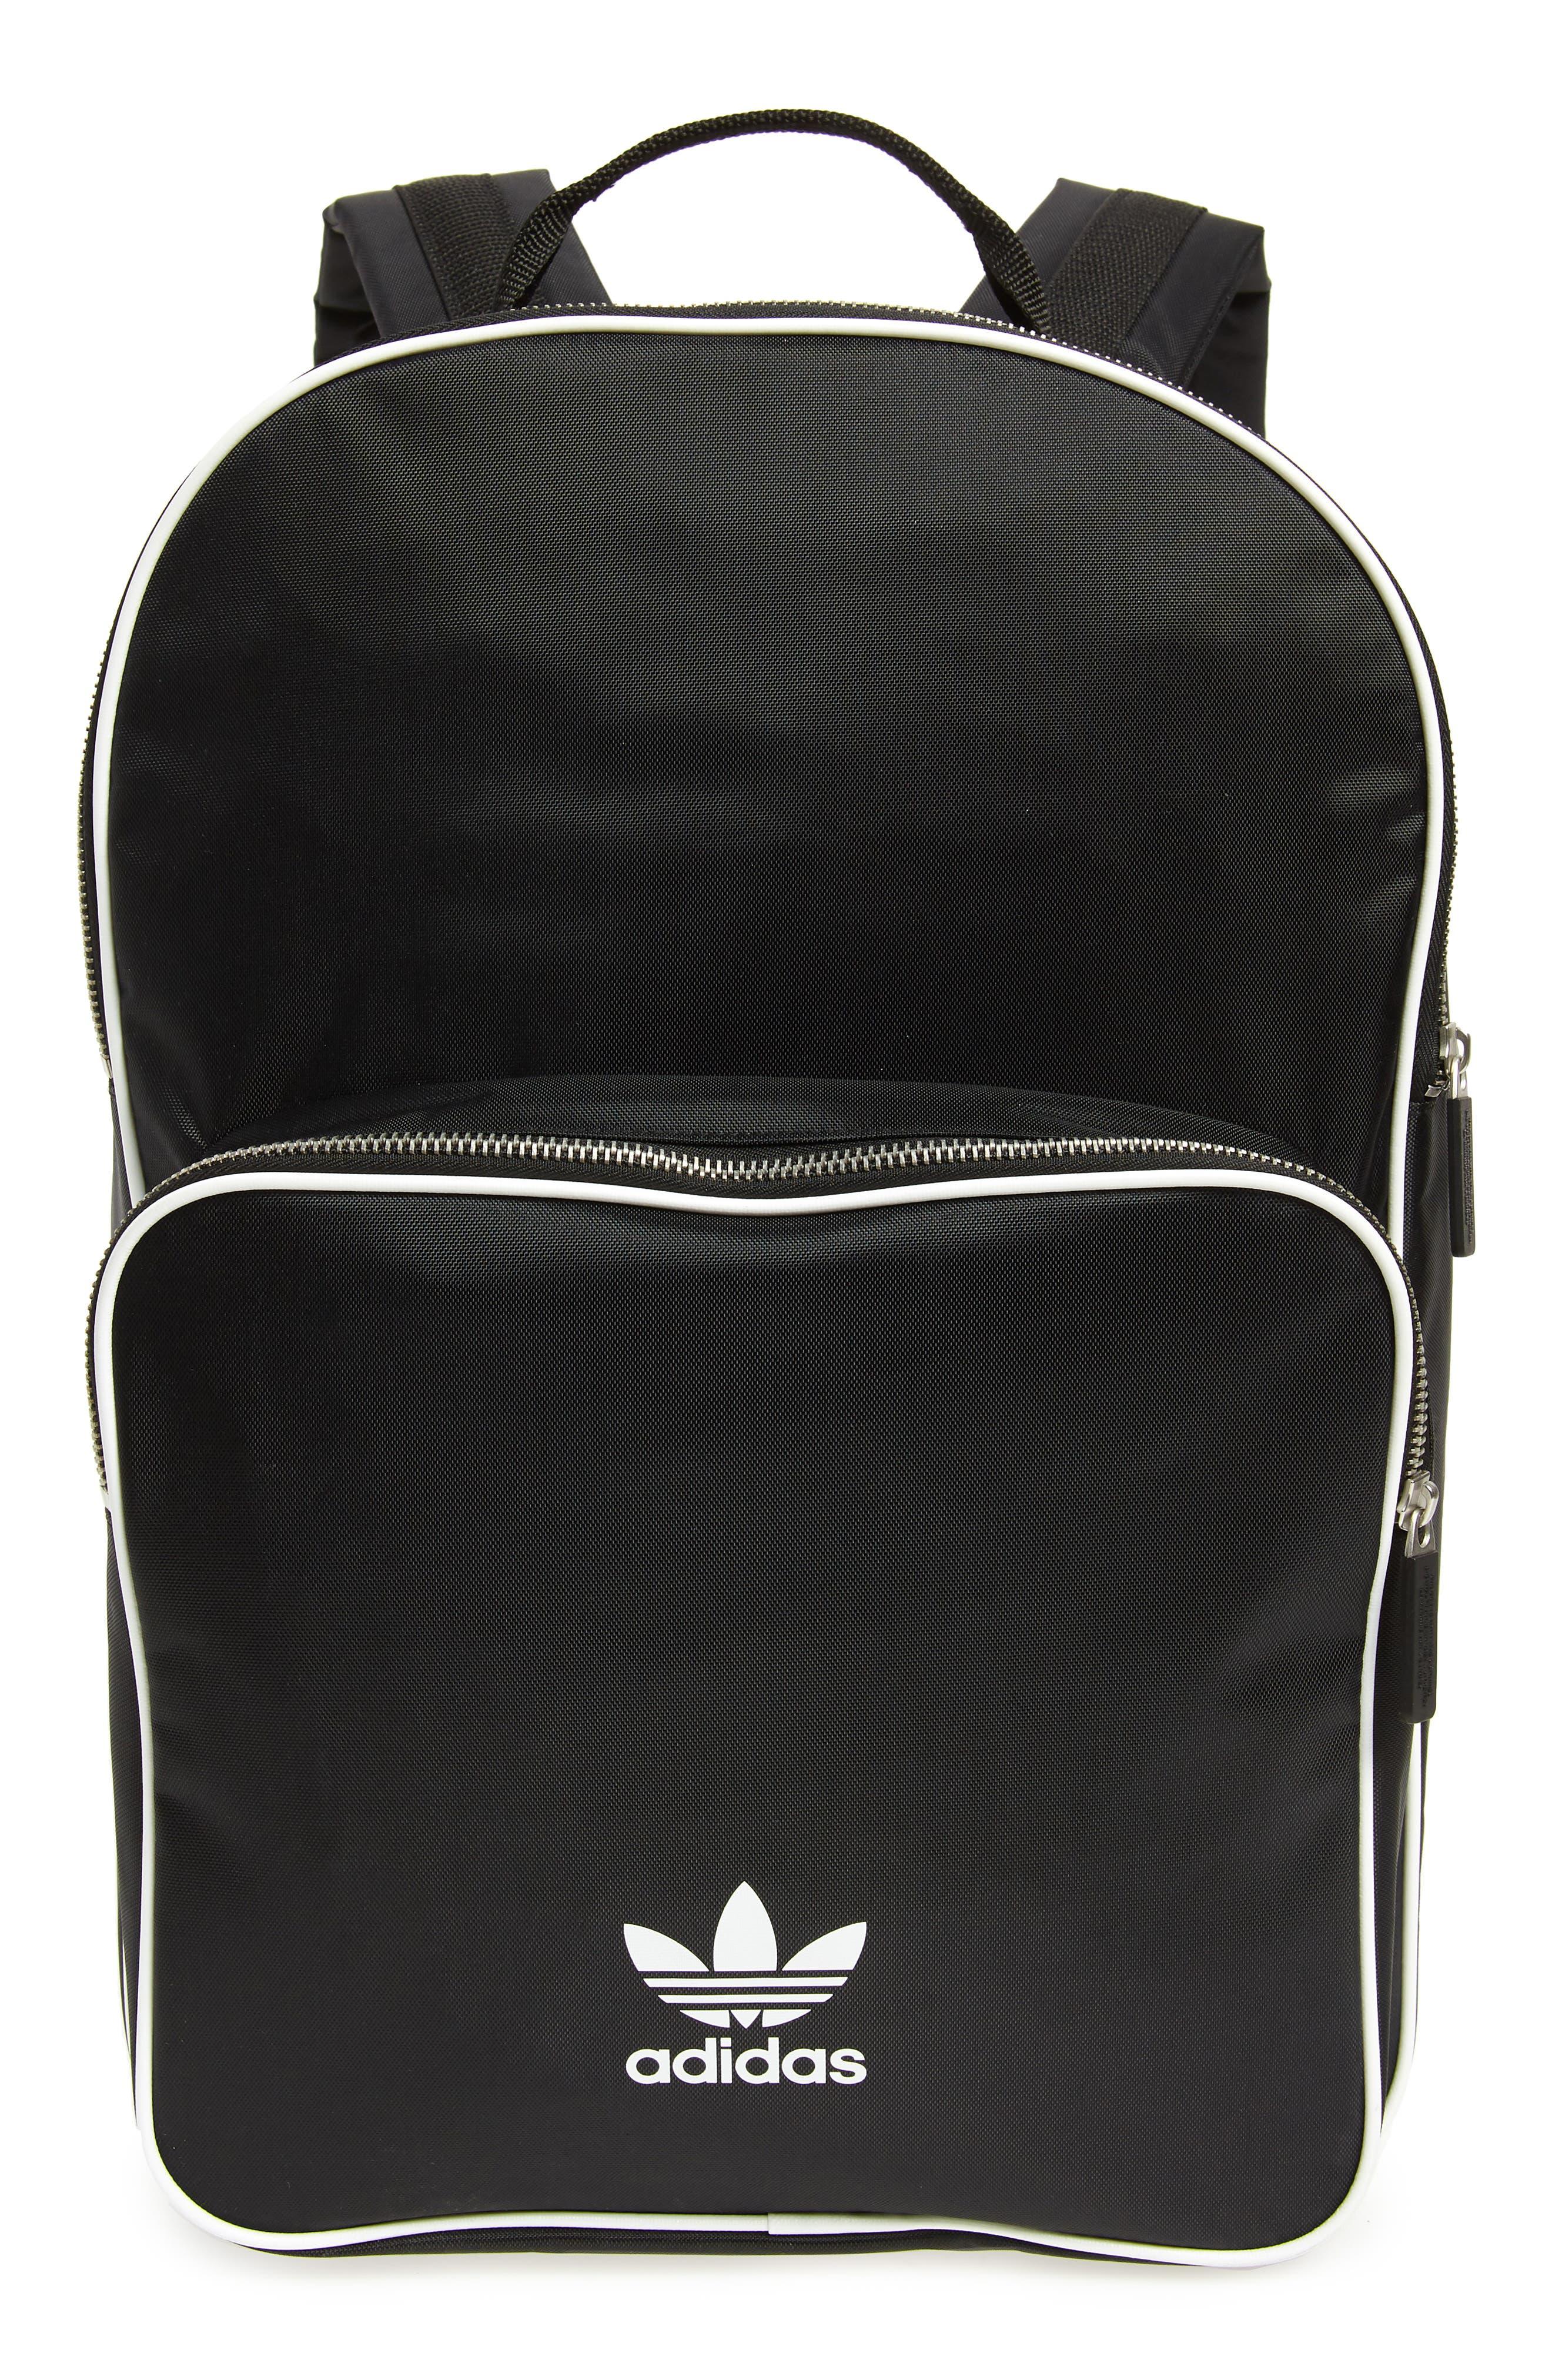 Adicolor Backpack,                             Main thumbnail 1, color,                             BLACK